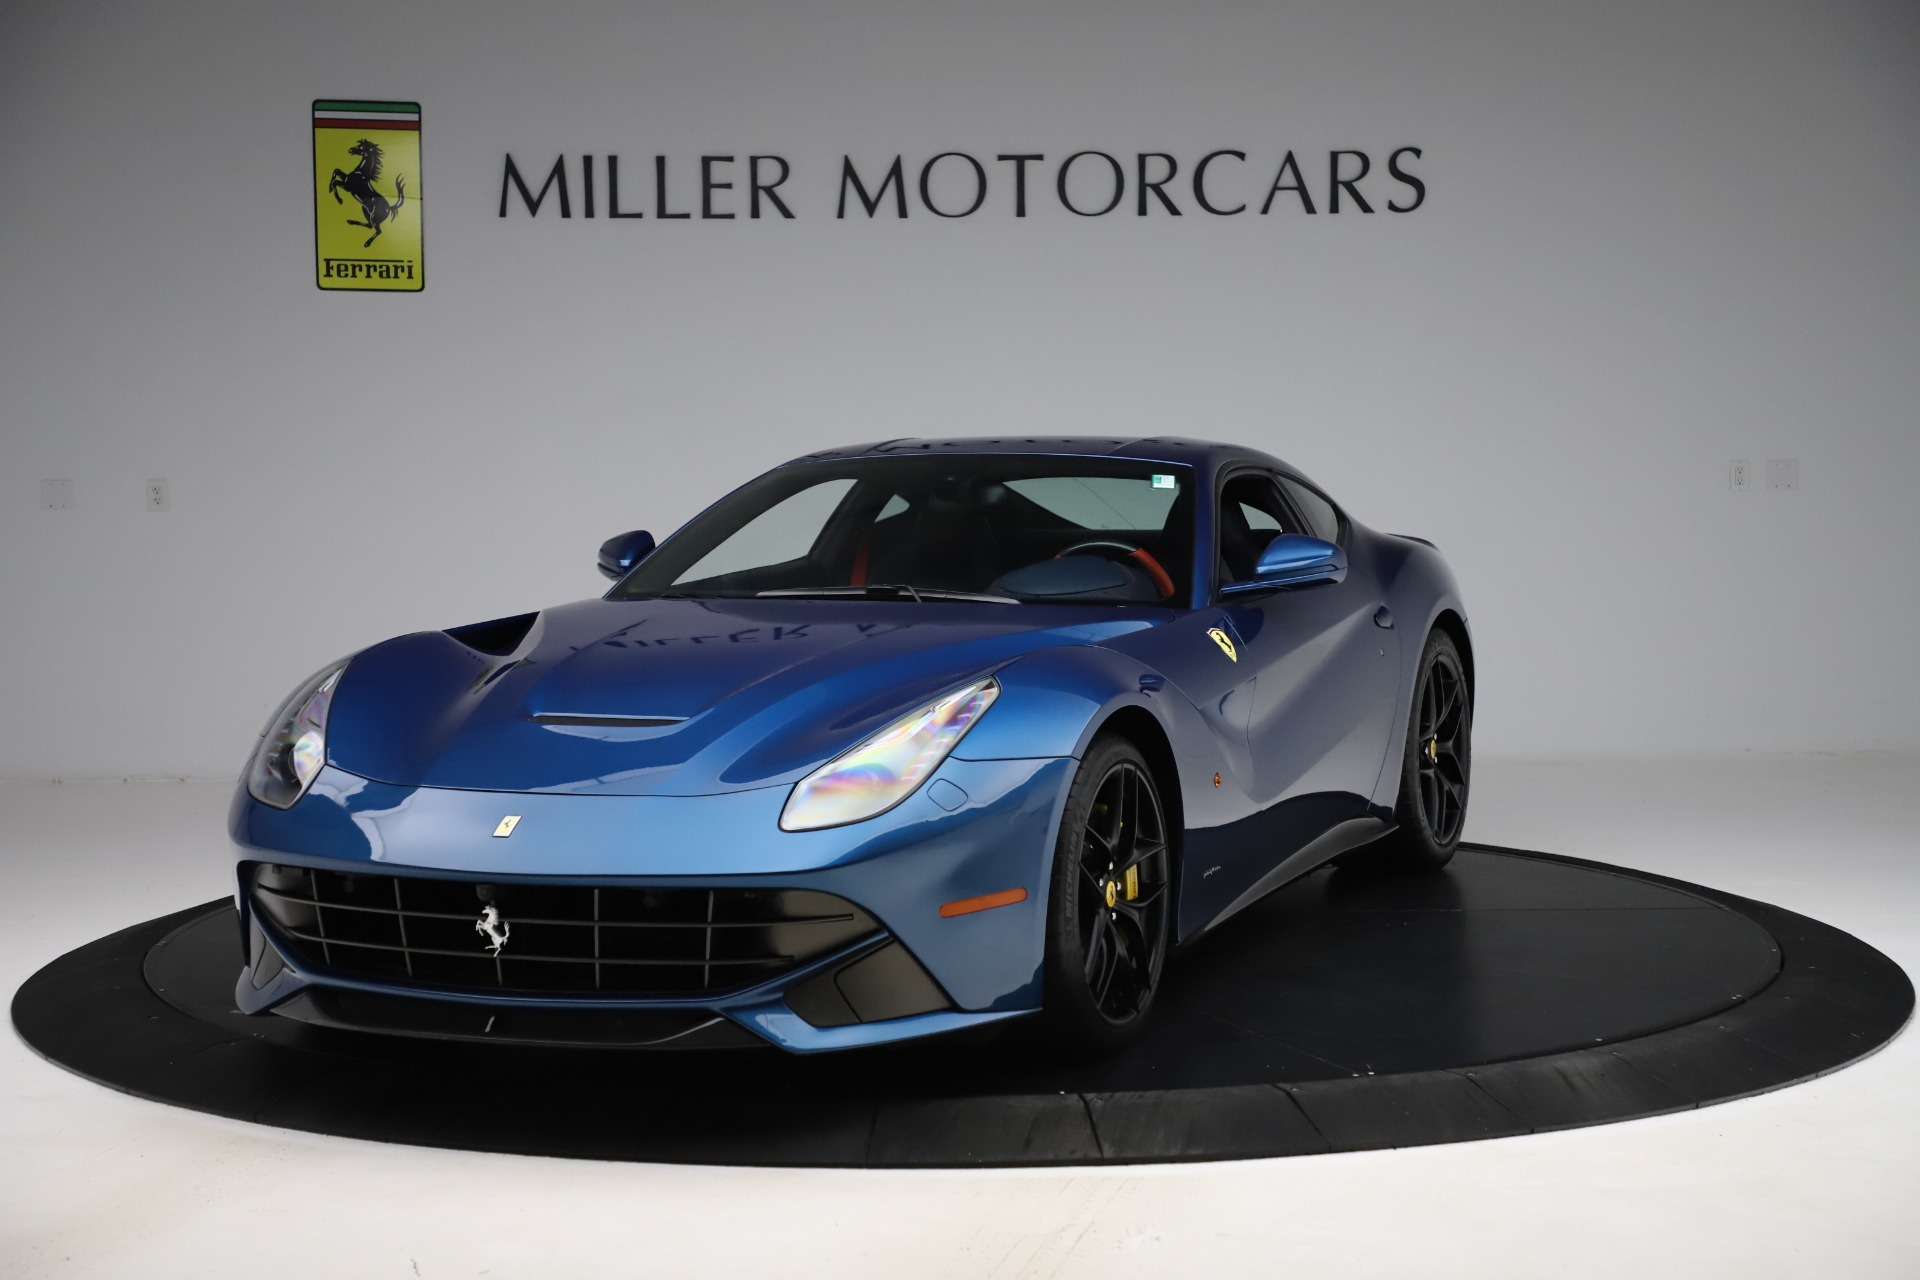 Used 2015 Ferrari F12 Berlinetta for sale Sold at Bentley Greenwich in Greenwich CT 06830 1